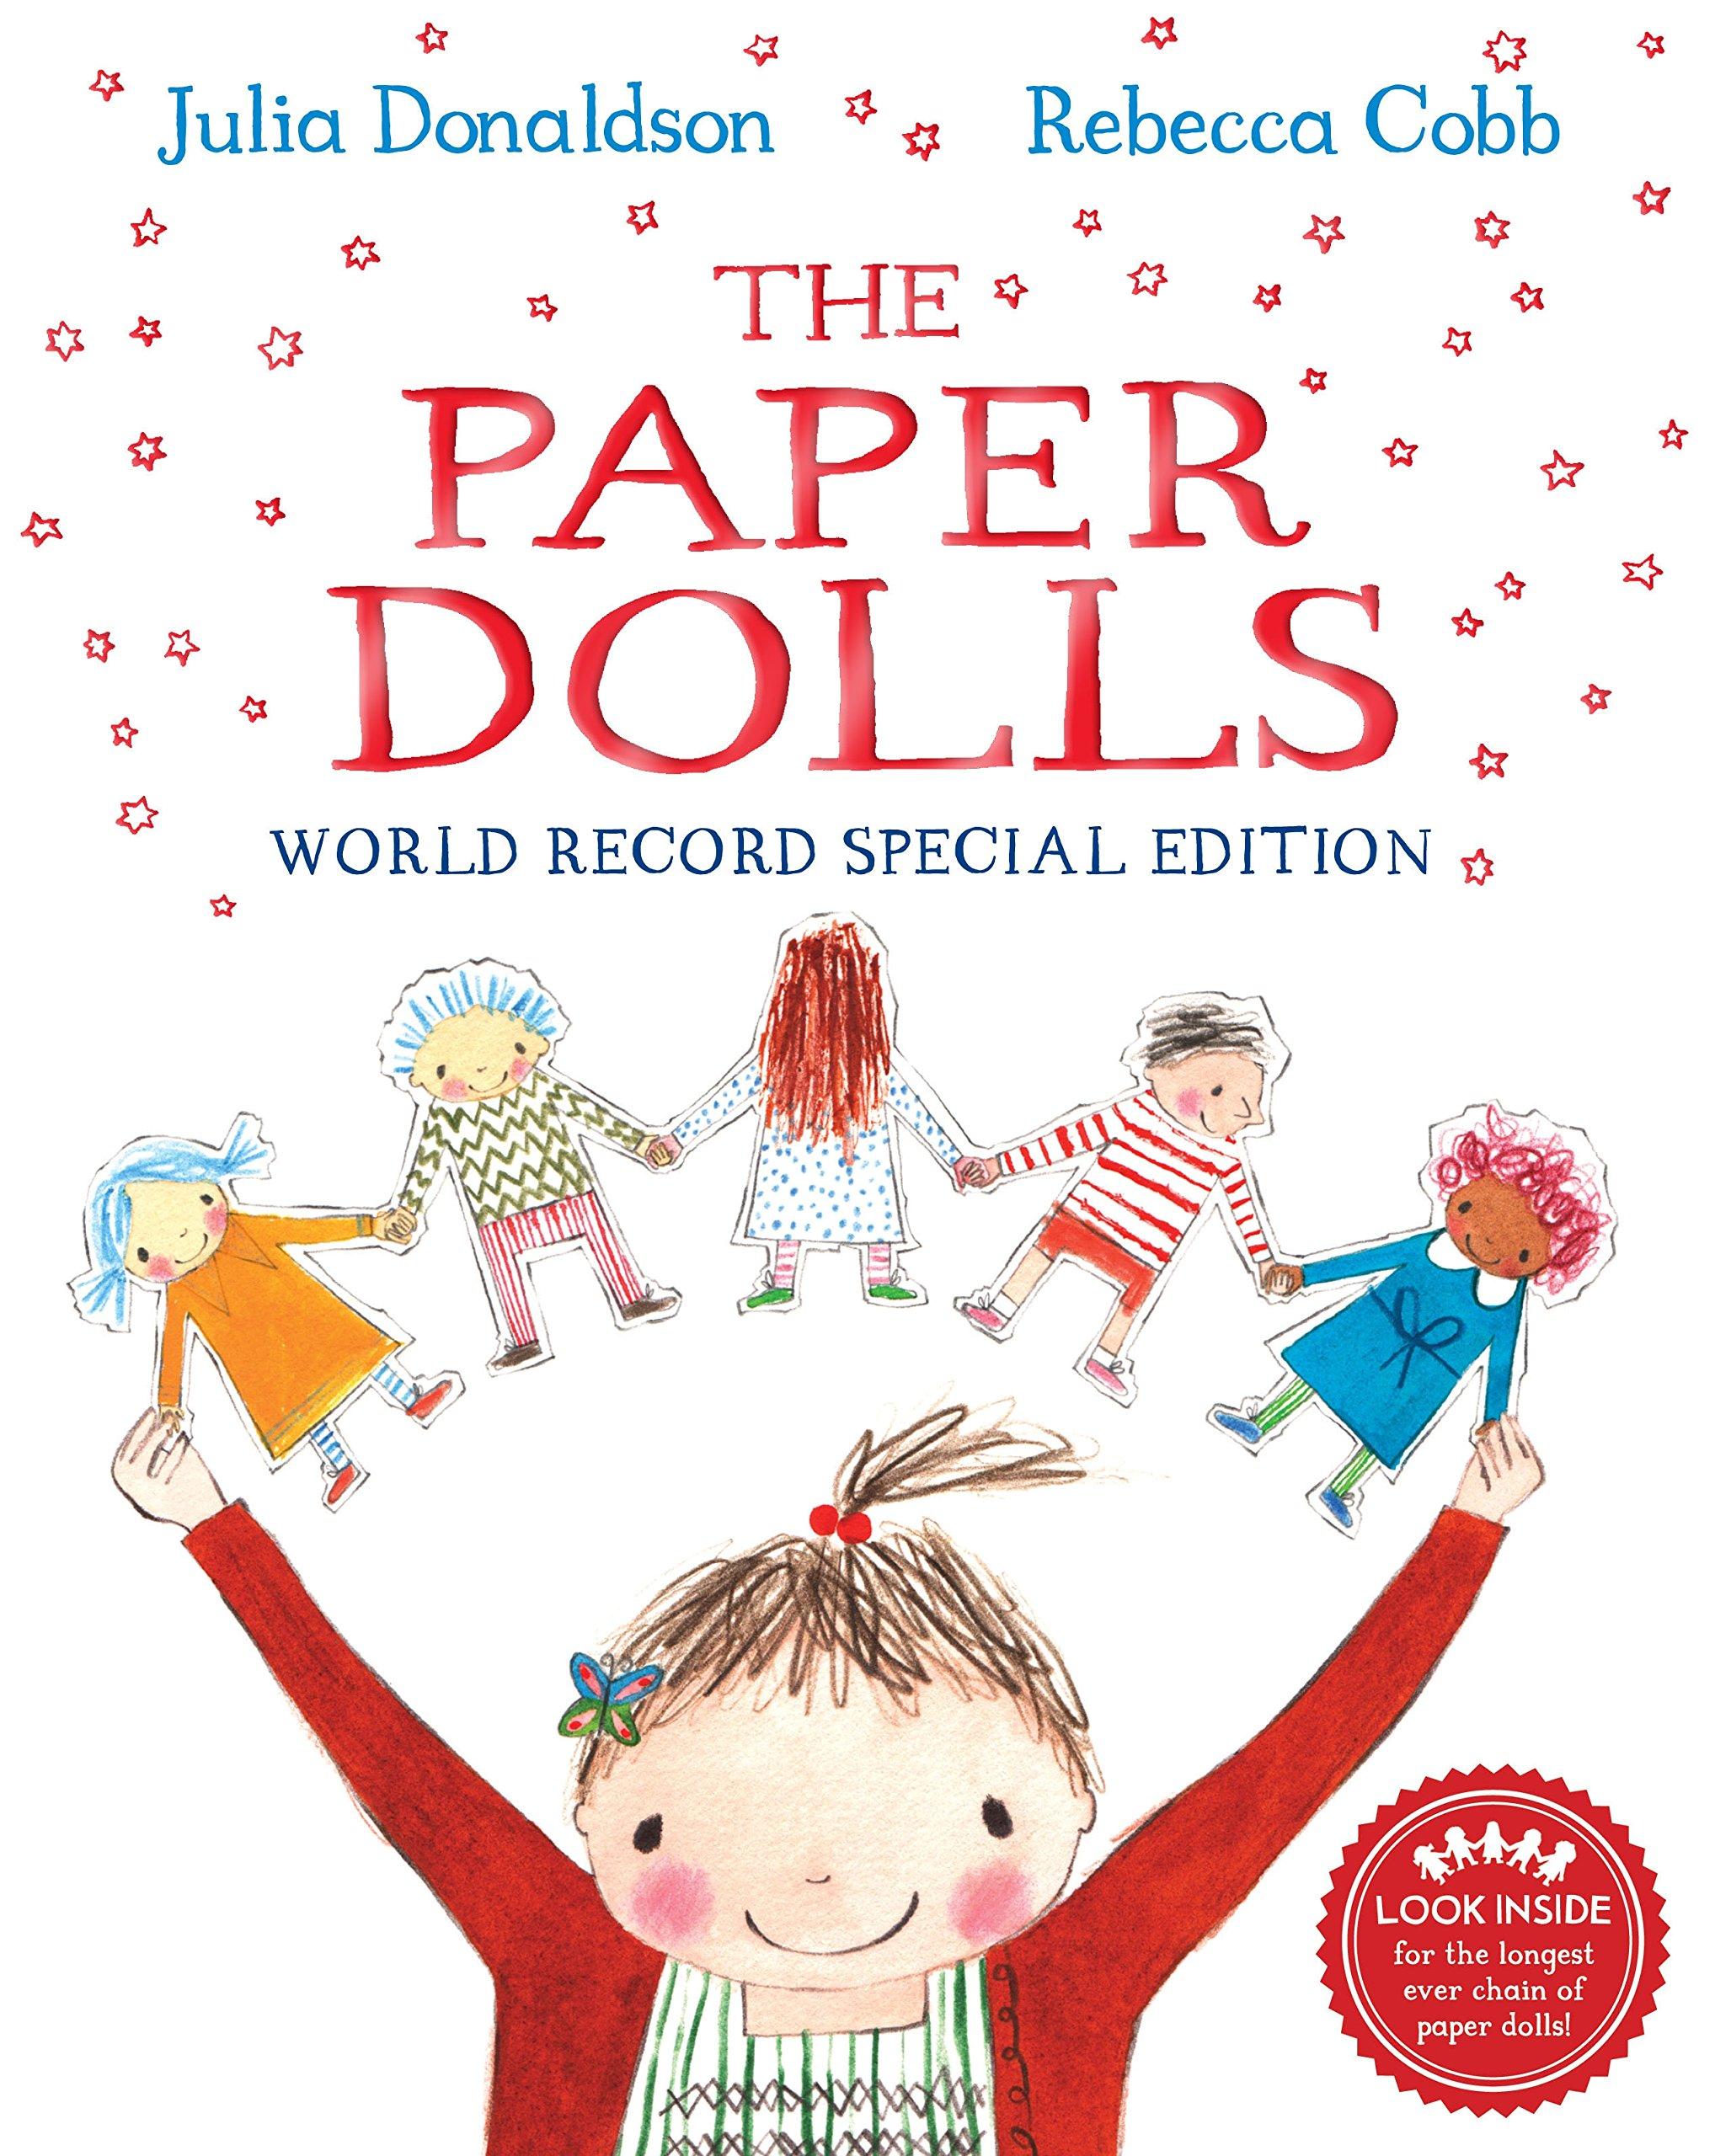 The Paper Dolls World Record Edition: Amazon.es: Donaldson, Julia, Cobb, Rebecca: Libros en idiomas extranjeros